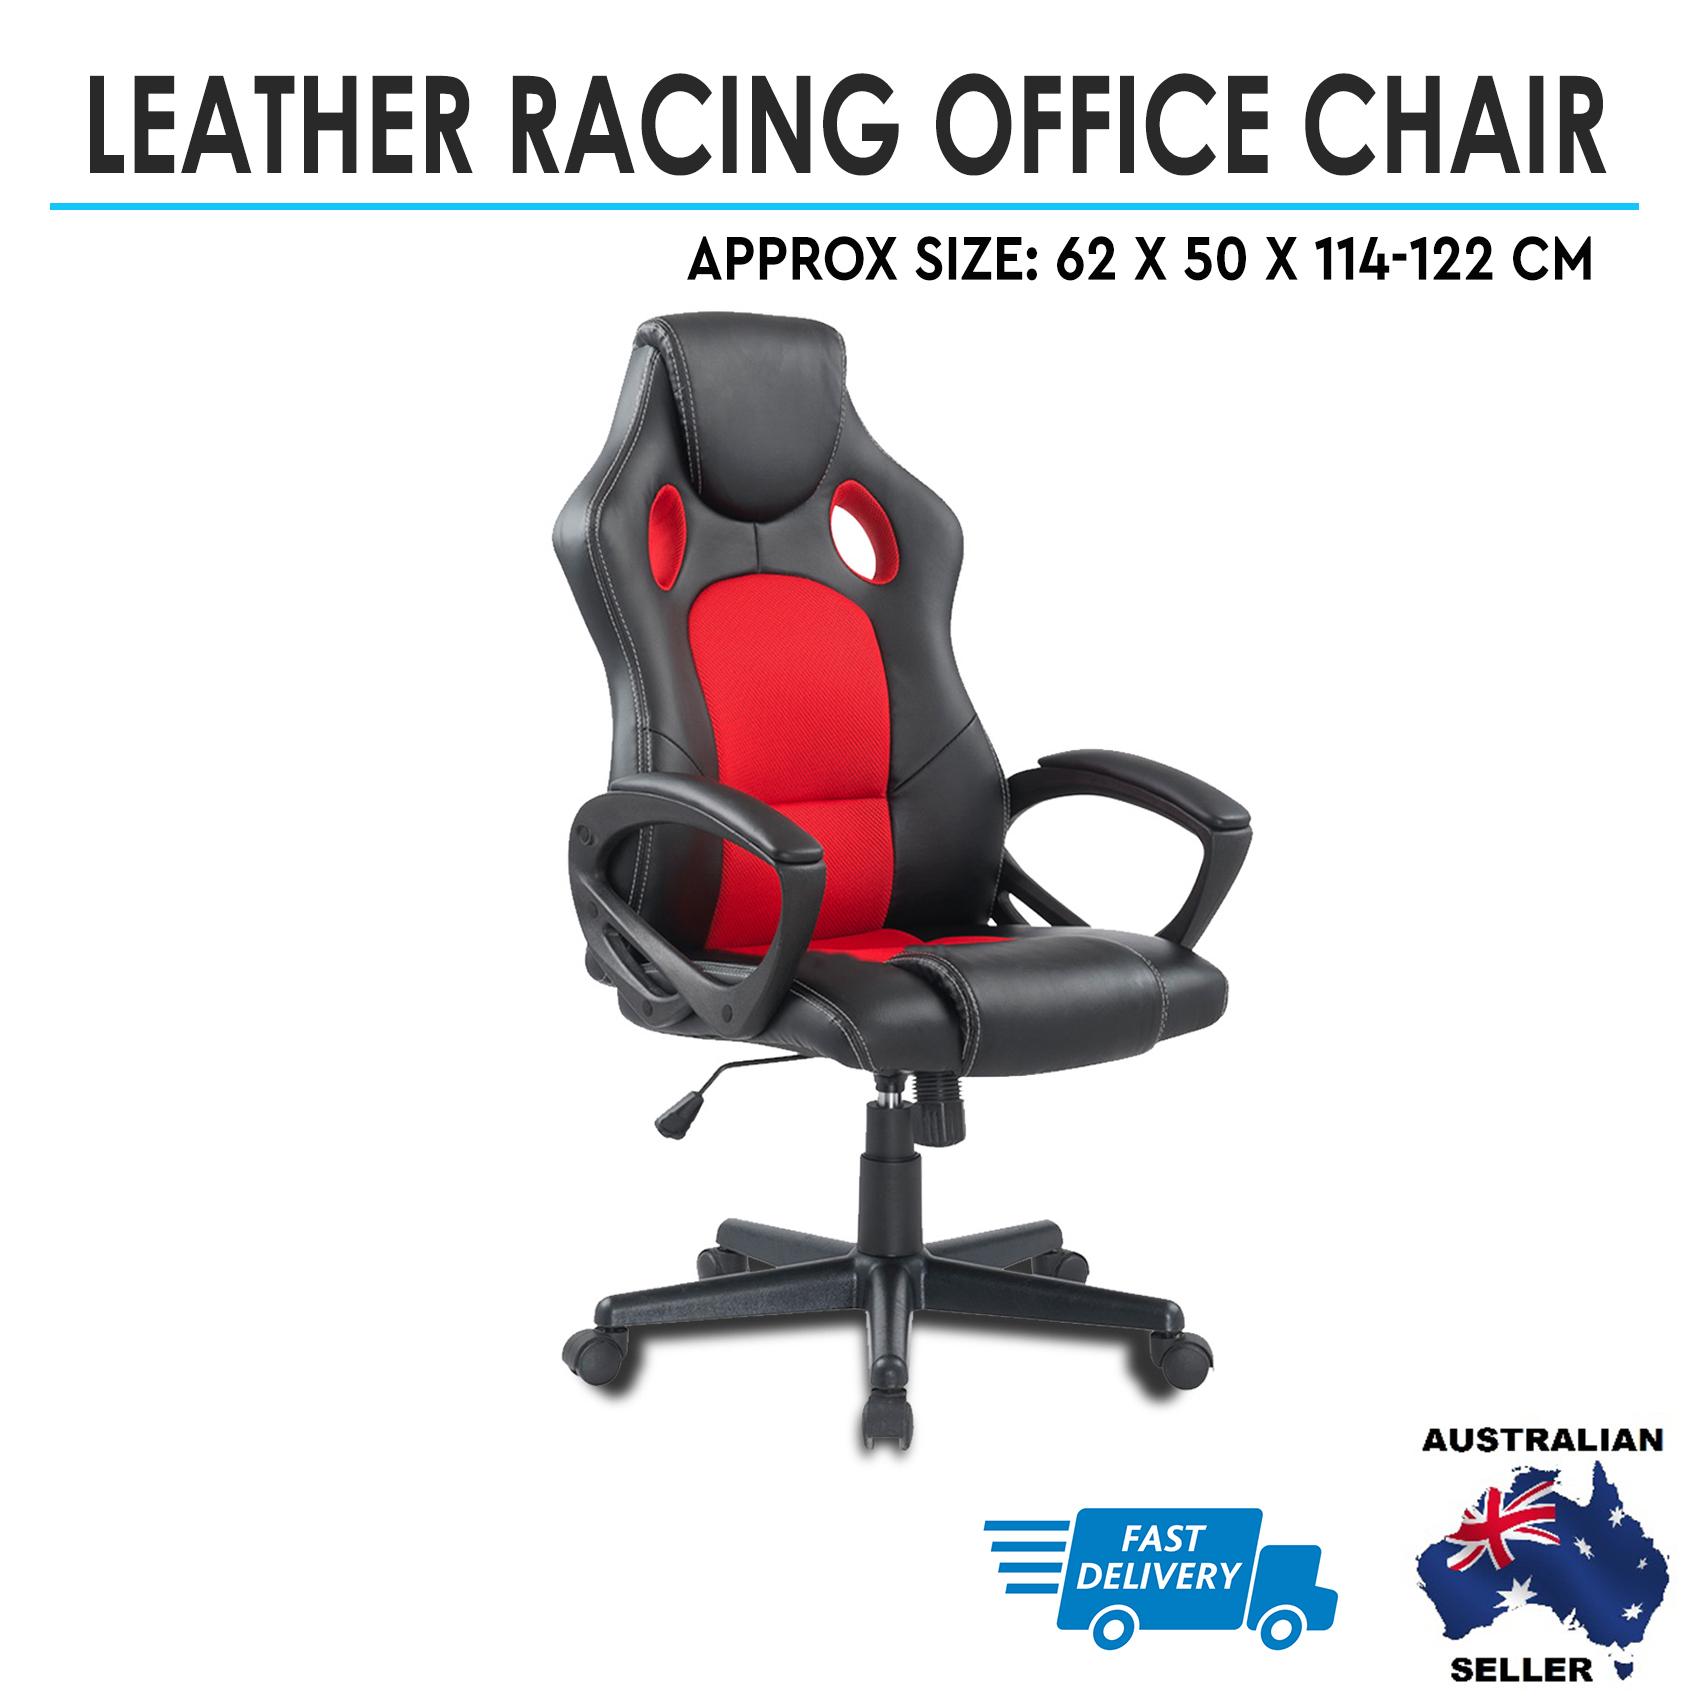 ergonomic chair kogan fishing kmart red office chairs cheap executive pu leather